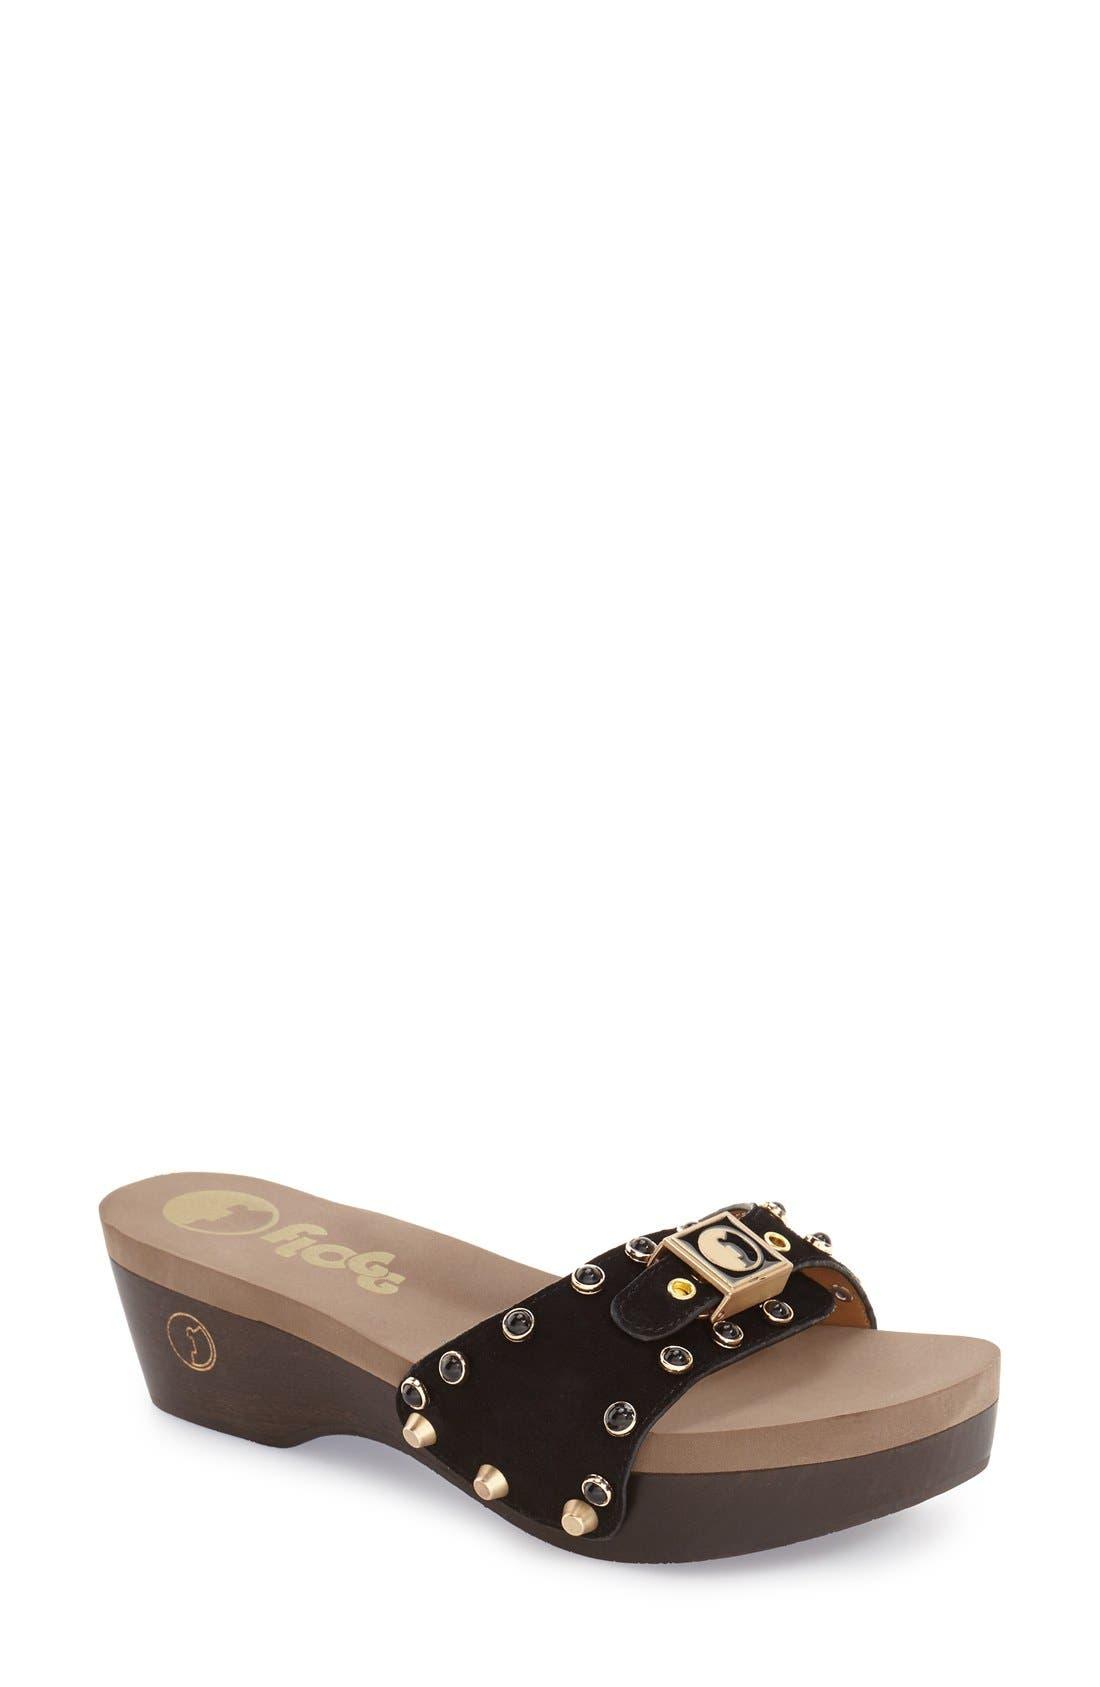 FLOGG 'Molly' Slide Sandal, Main, color, 001